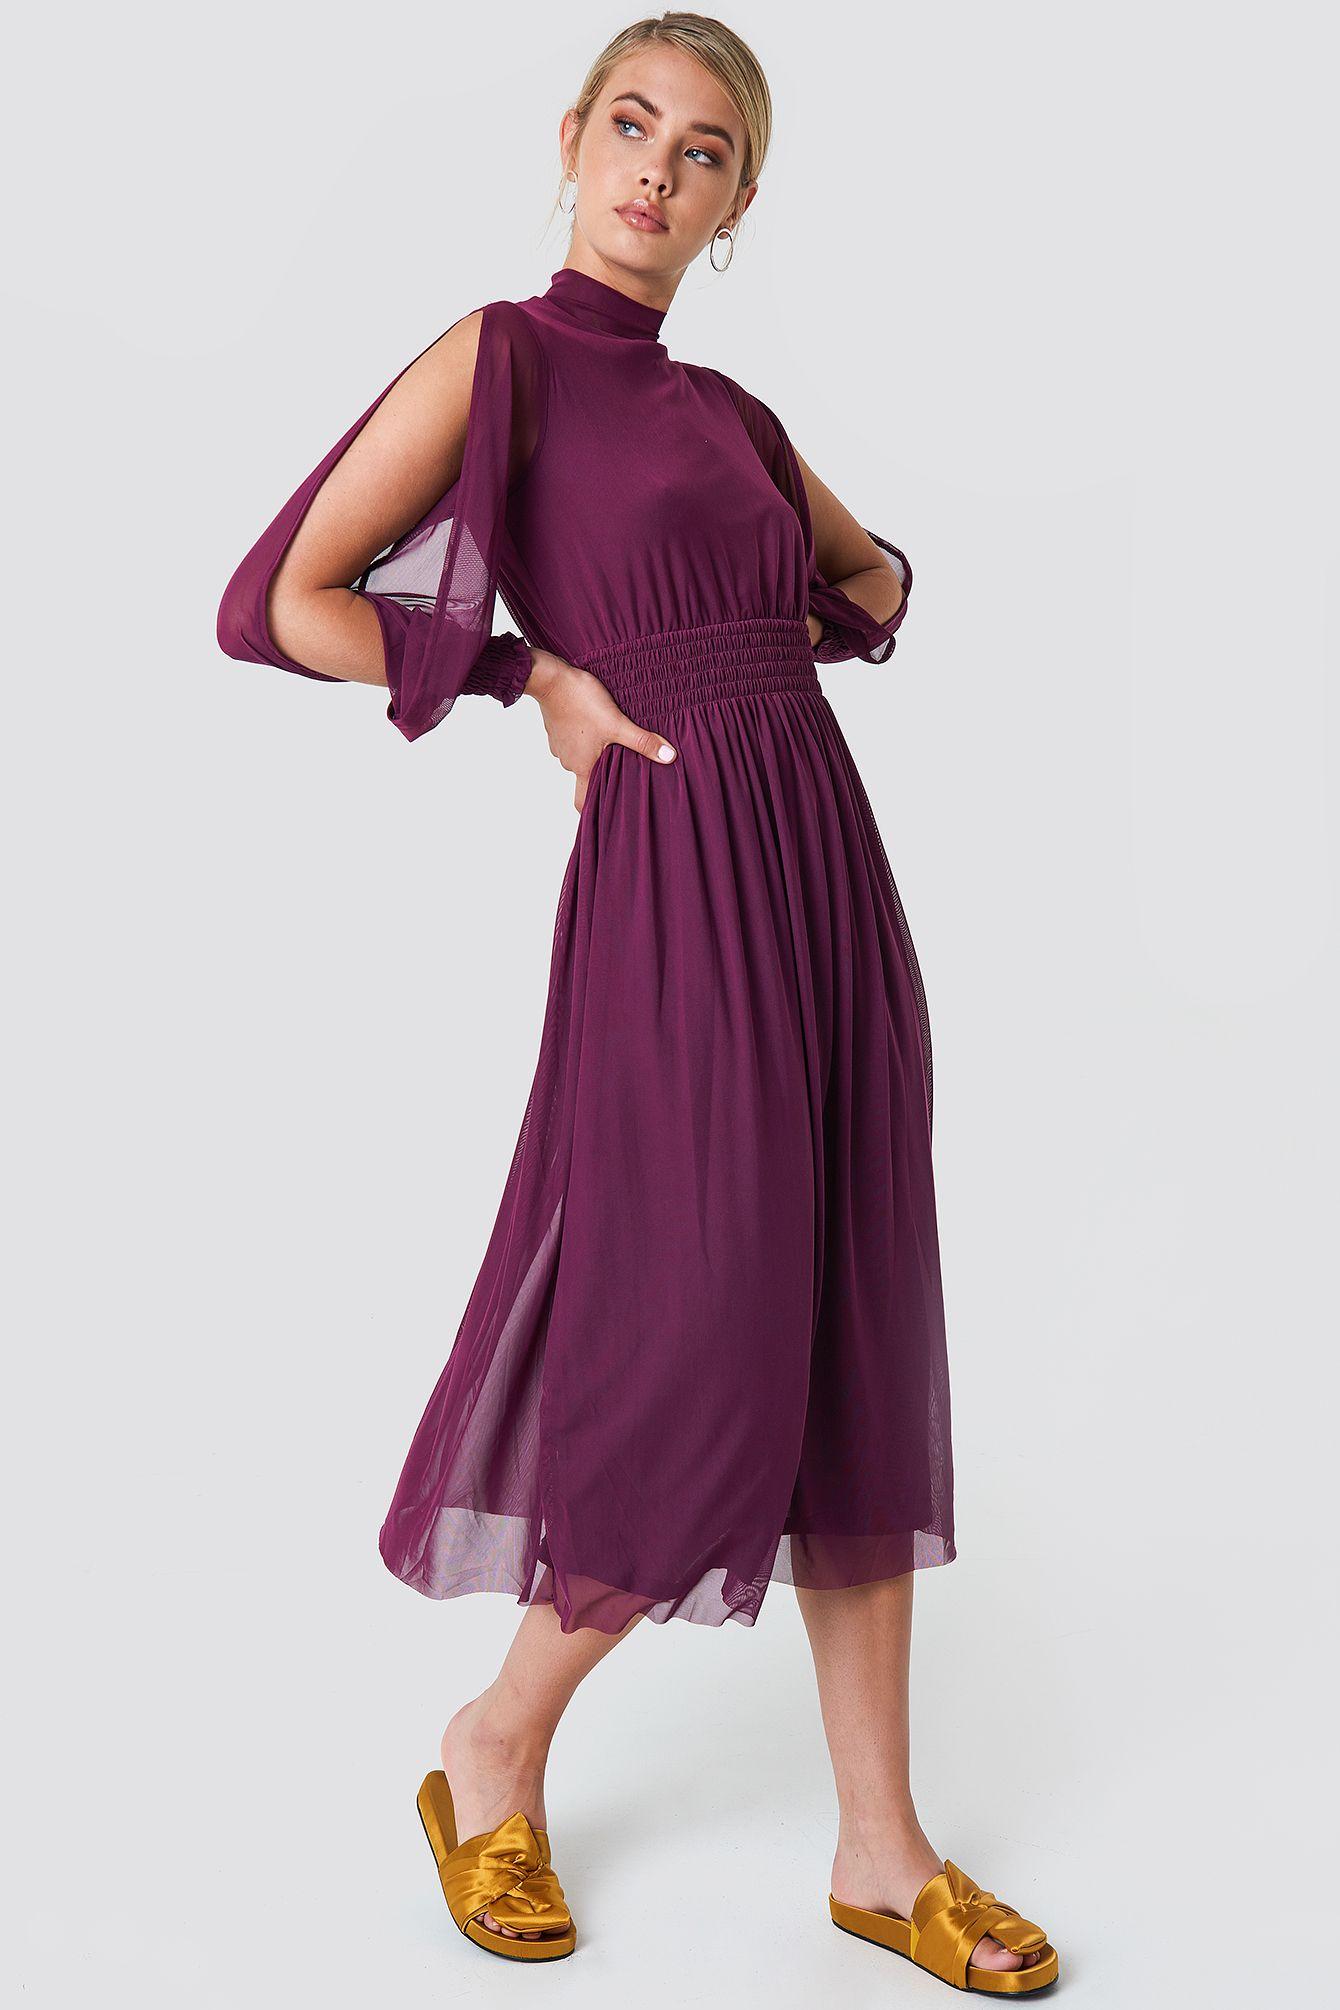 Mesh Open Sleeve Dress in 2020 | Kleid mit ärmel, Modestil ...